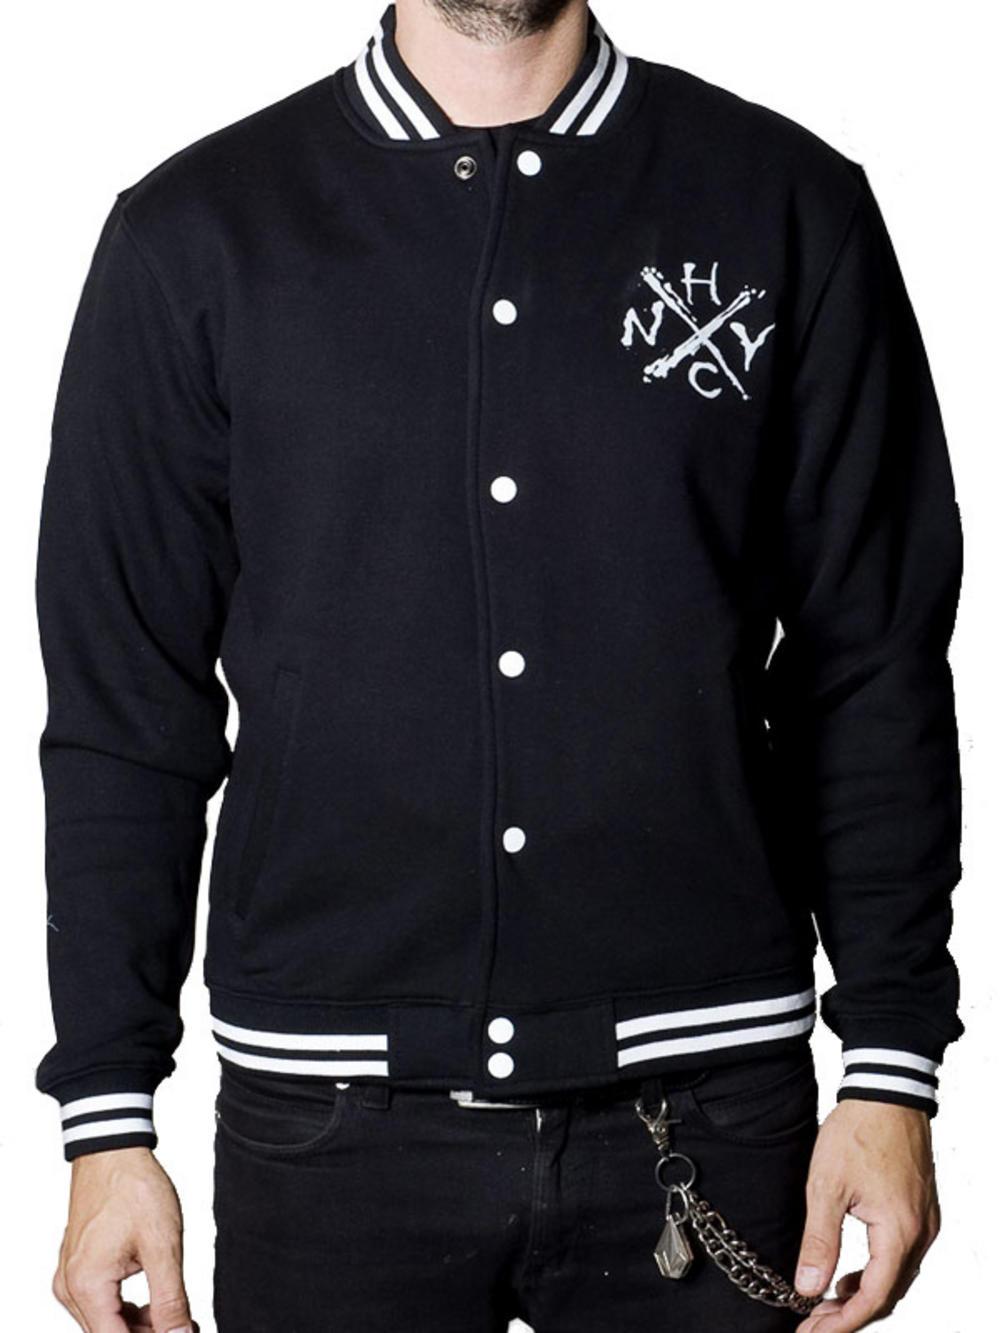 Madball (HC Pride) College Jacket